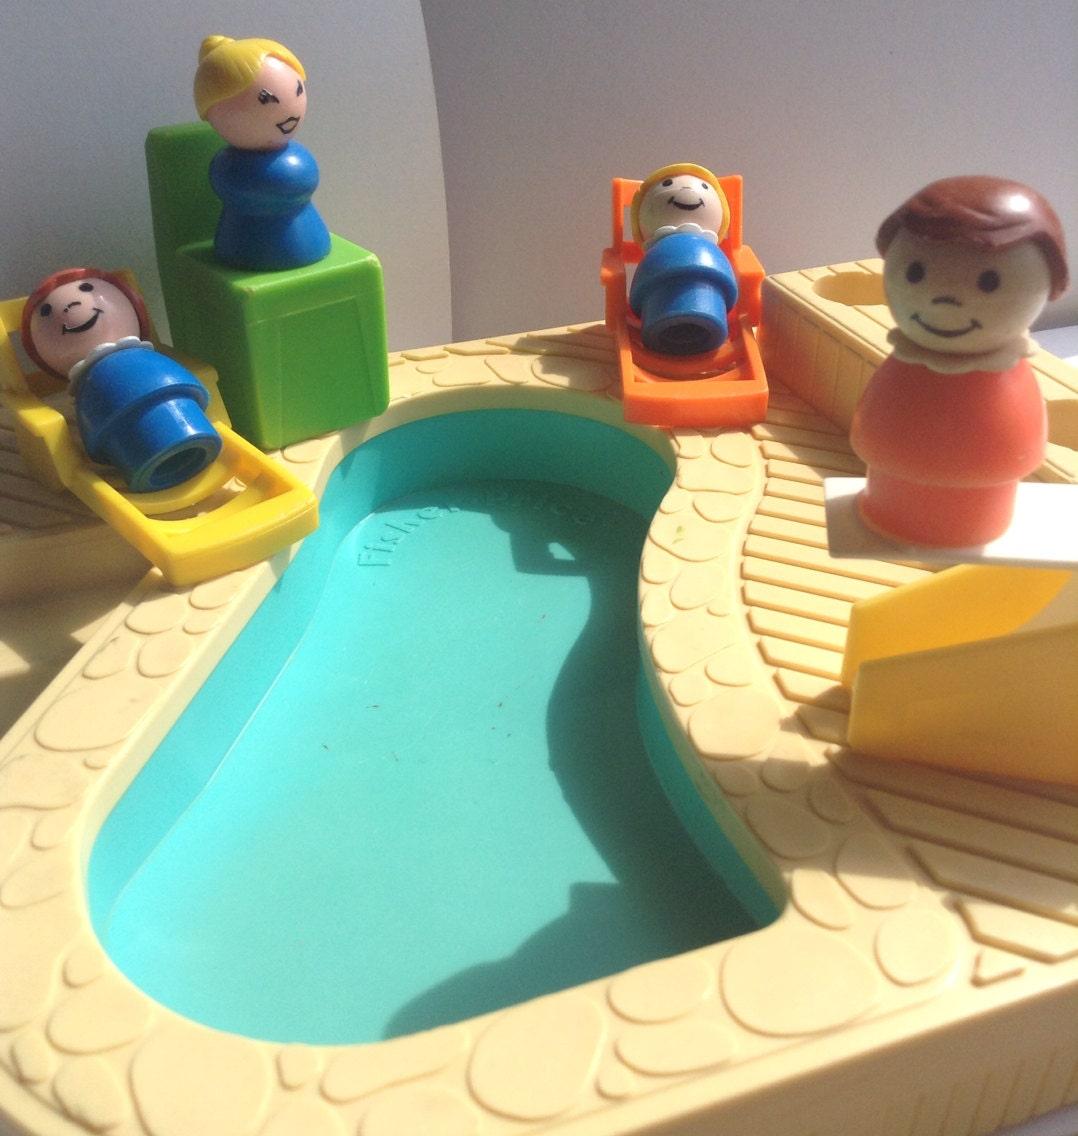 Fisher Price Swimming Pool Set Little People figures sun